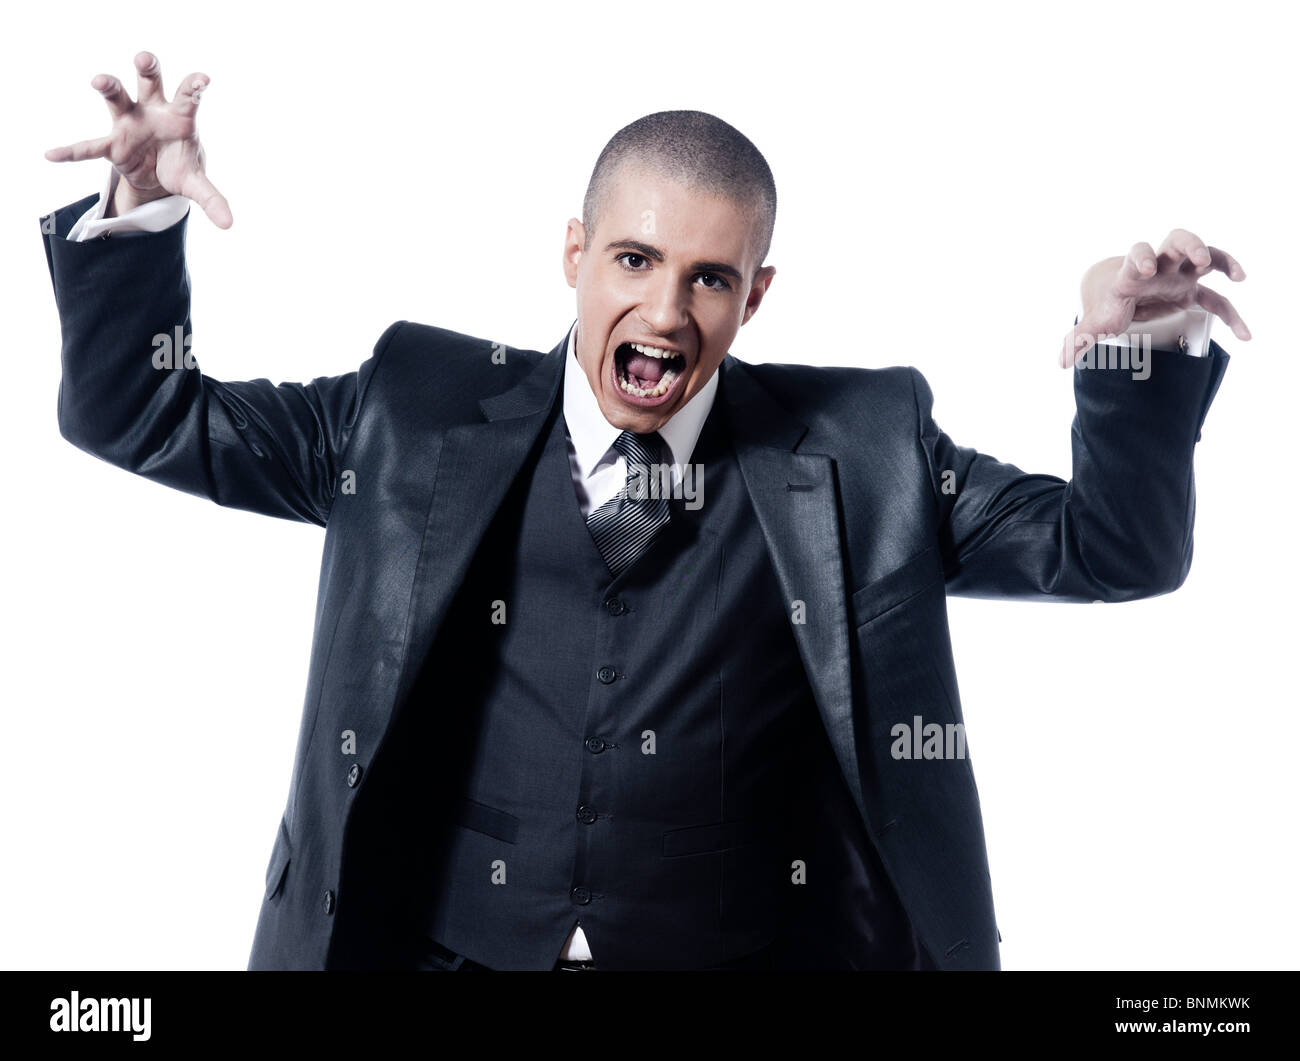 Hombre caucásico gracioso empresario gritando retrato de estudio aislado sobre fondo blanco. Imagen De Stock